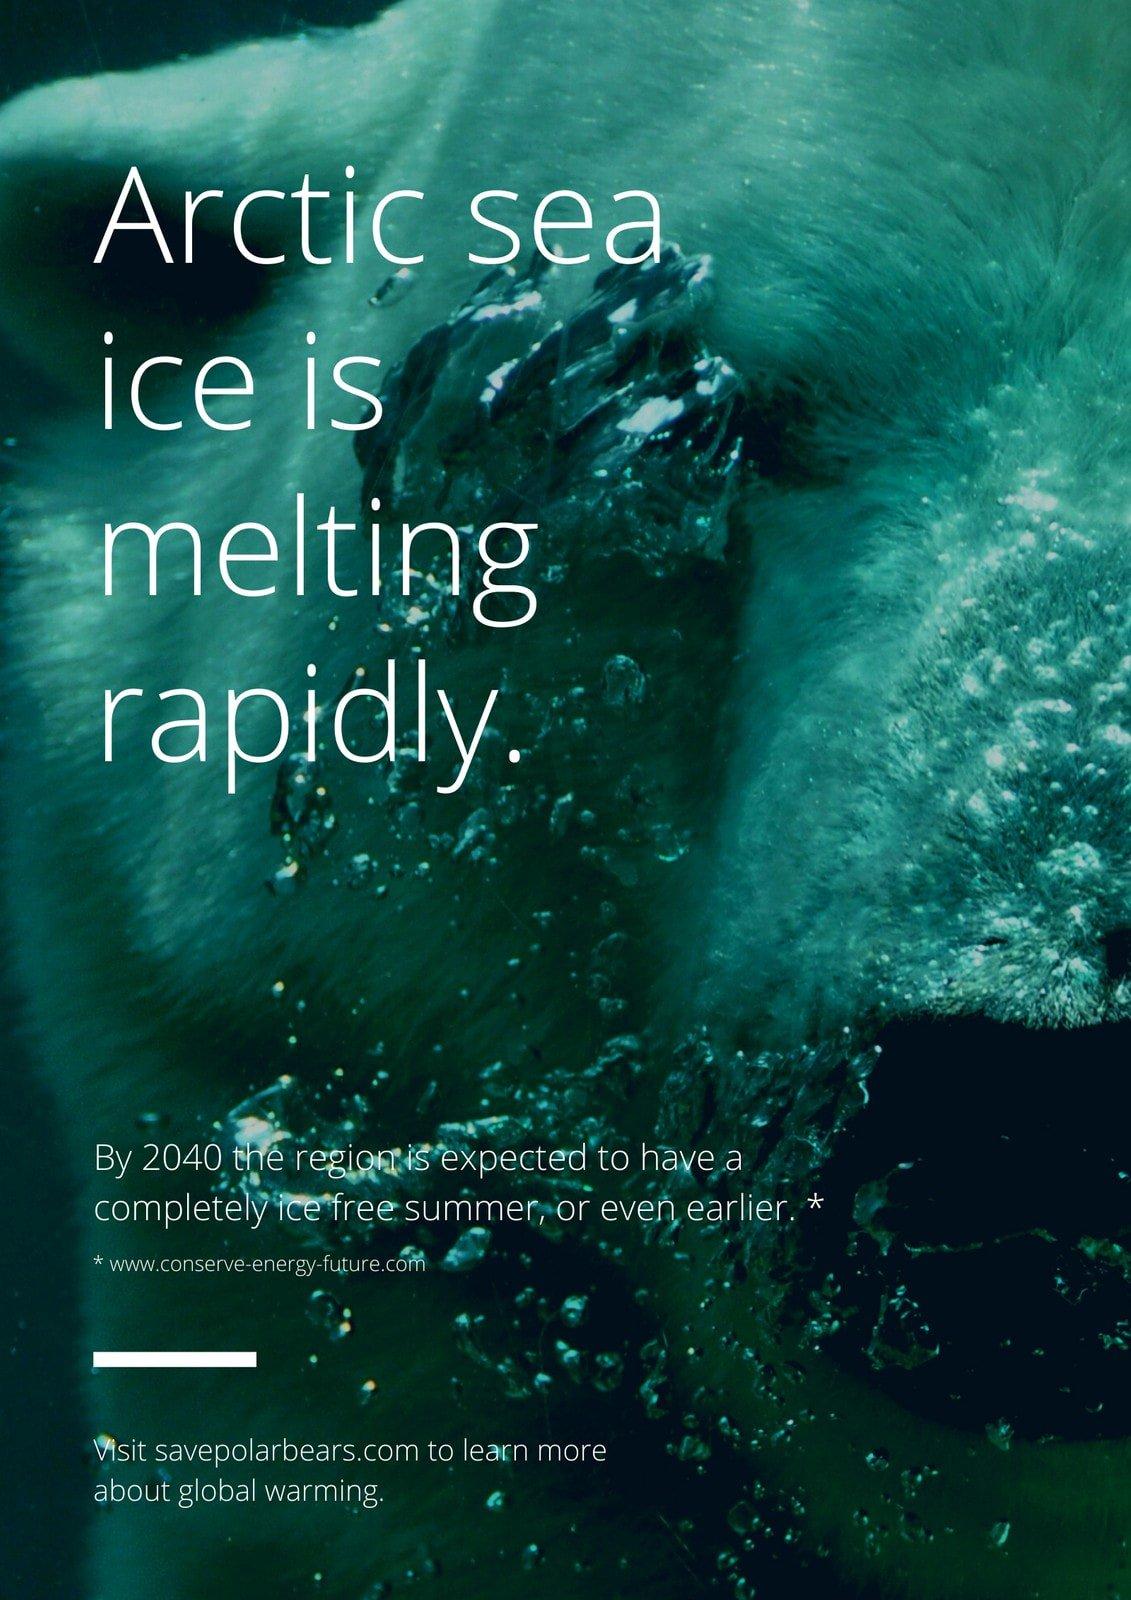 Blue & White Polar Bear Photo Global Warming Awareness Statistics Poster